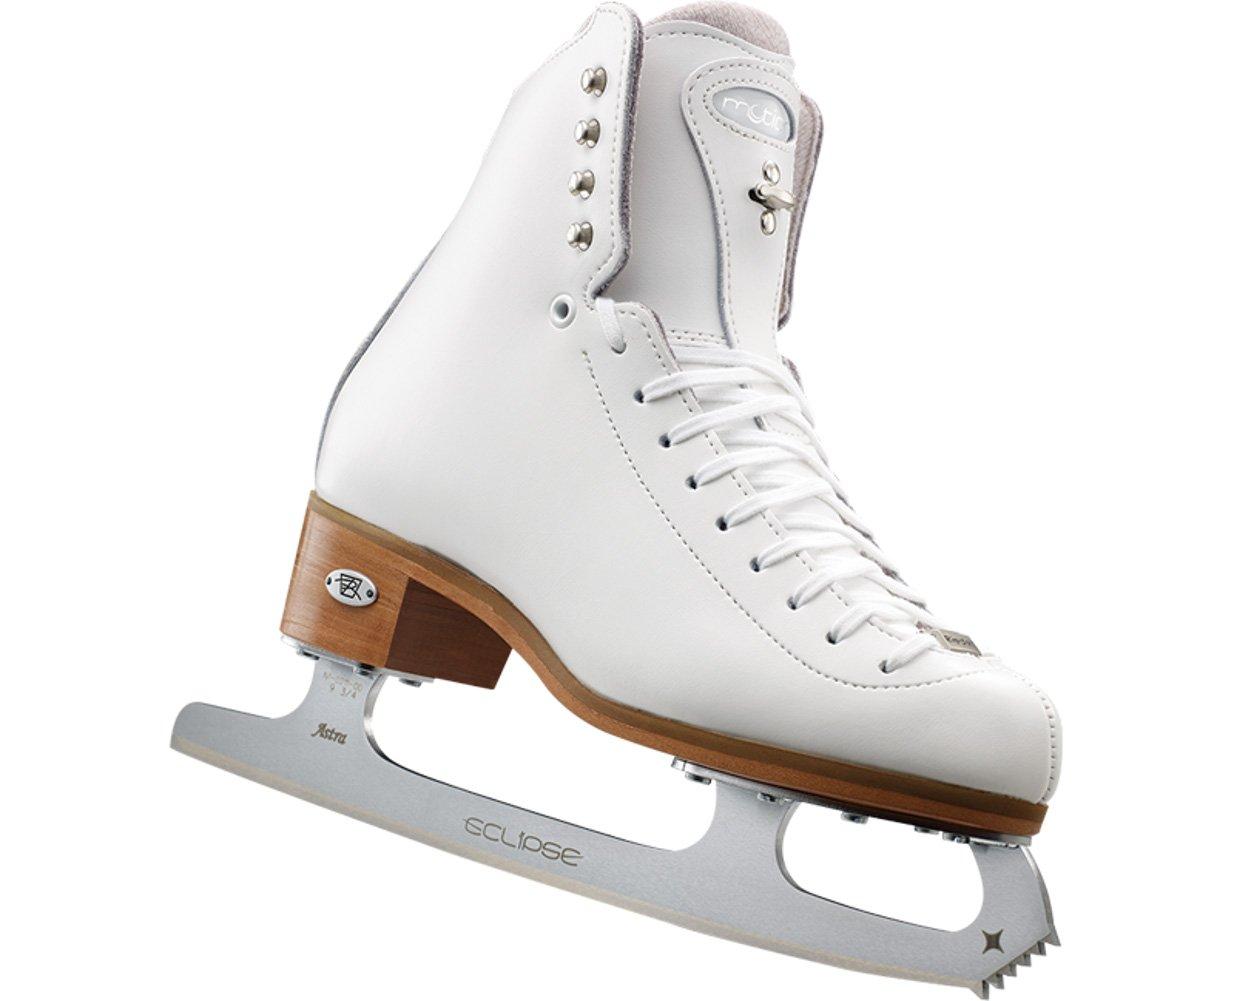 Riedell 25 Motion – 白い Girls Figure Skate Narrow 3